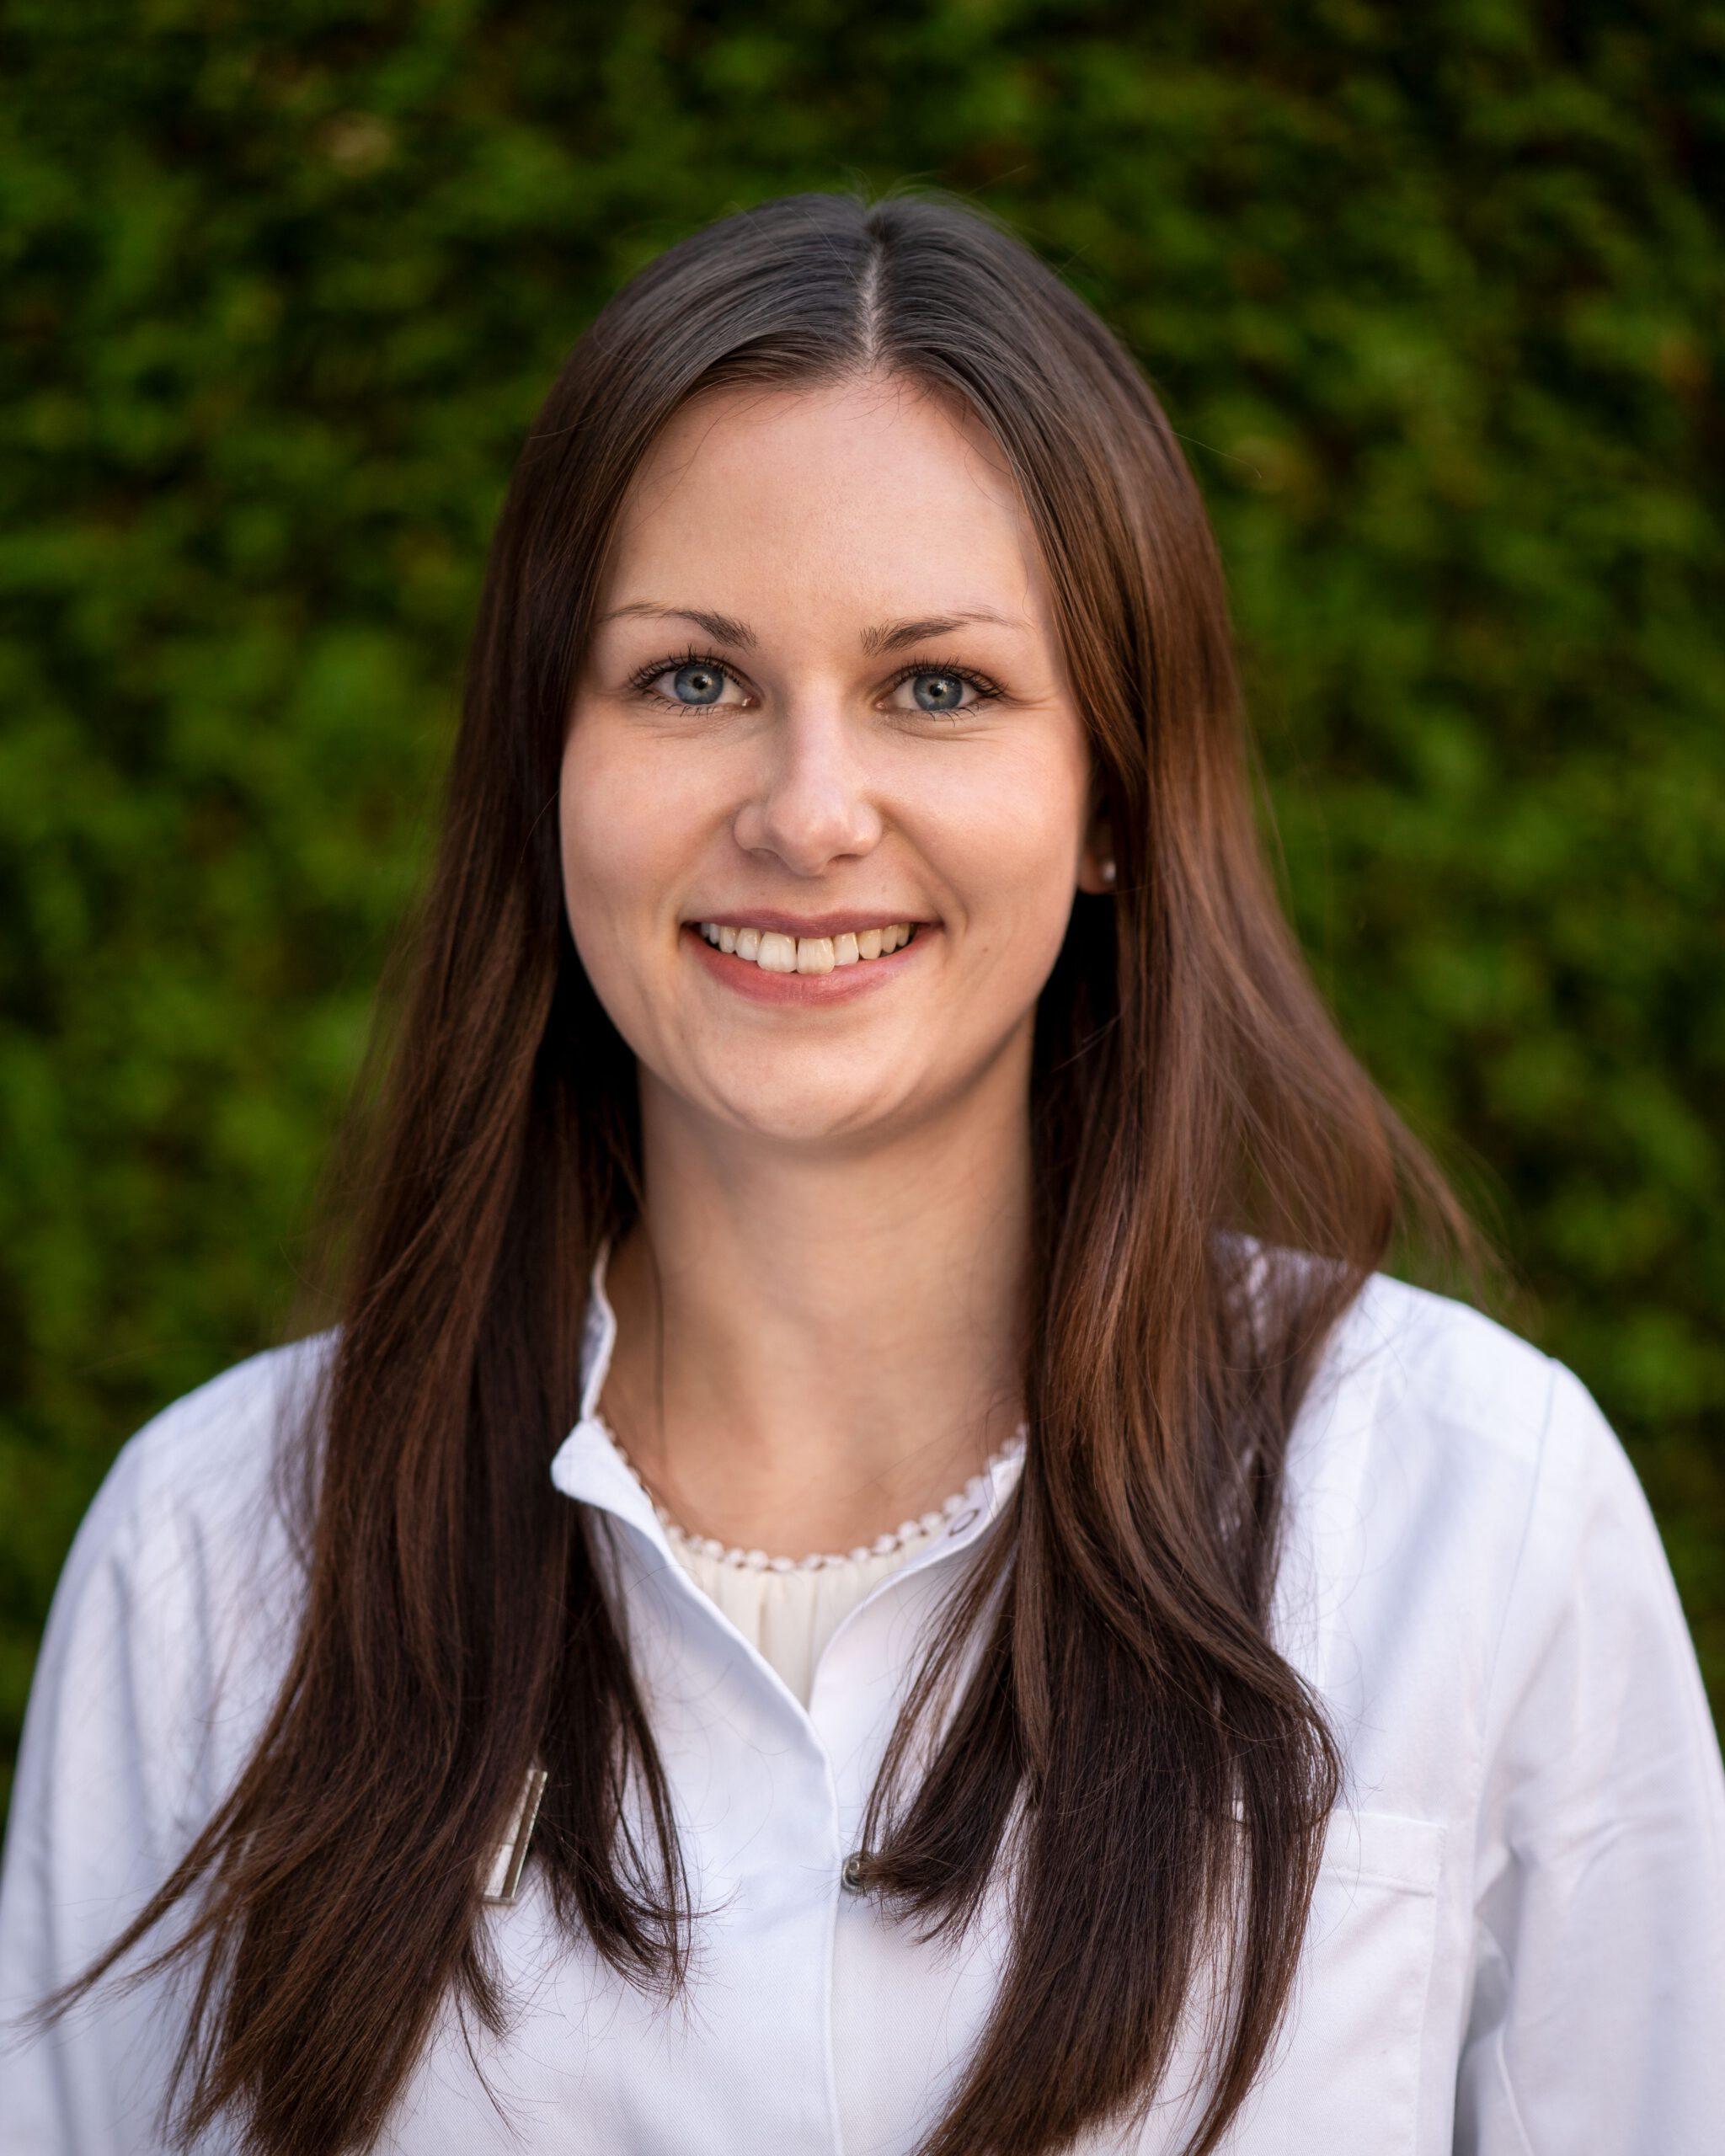 Frau Aleksandra Bak (Apothekerin)